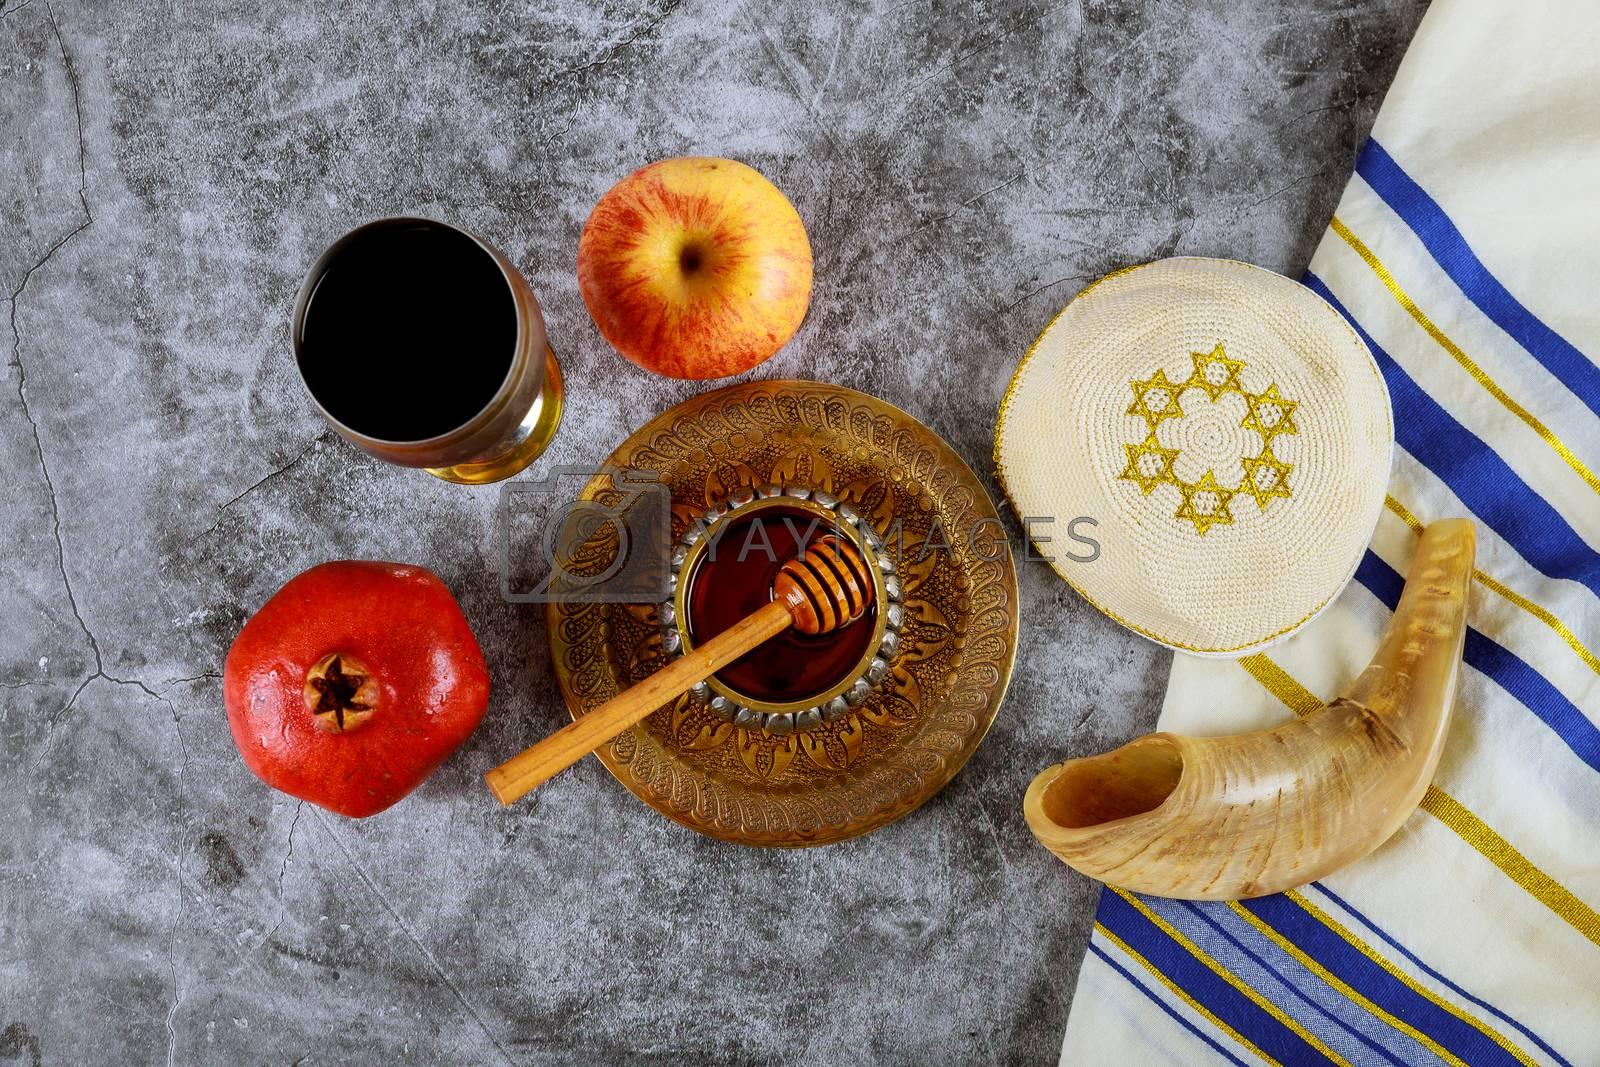 Rosh hashanah with glass honey jar and fresh ripe apples. Jewish new year symbols shofar and tallit